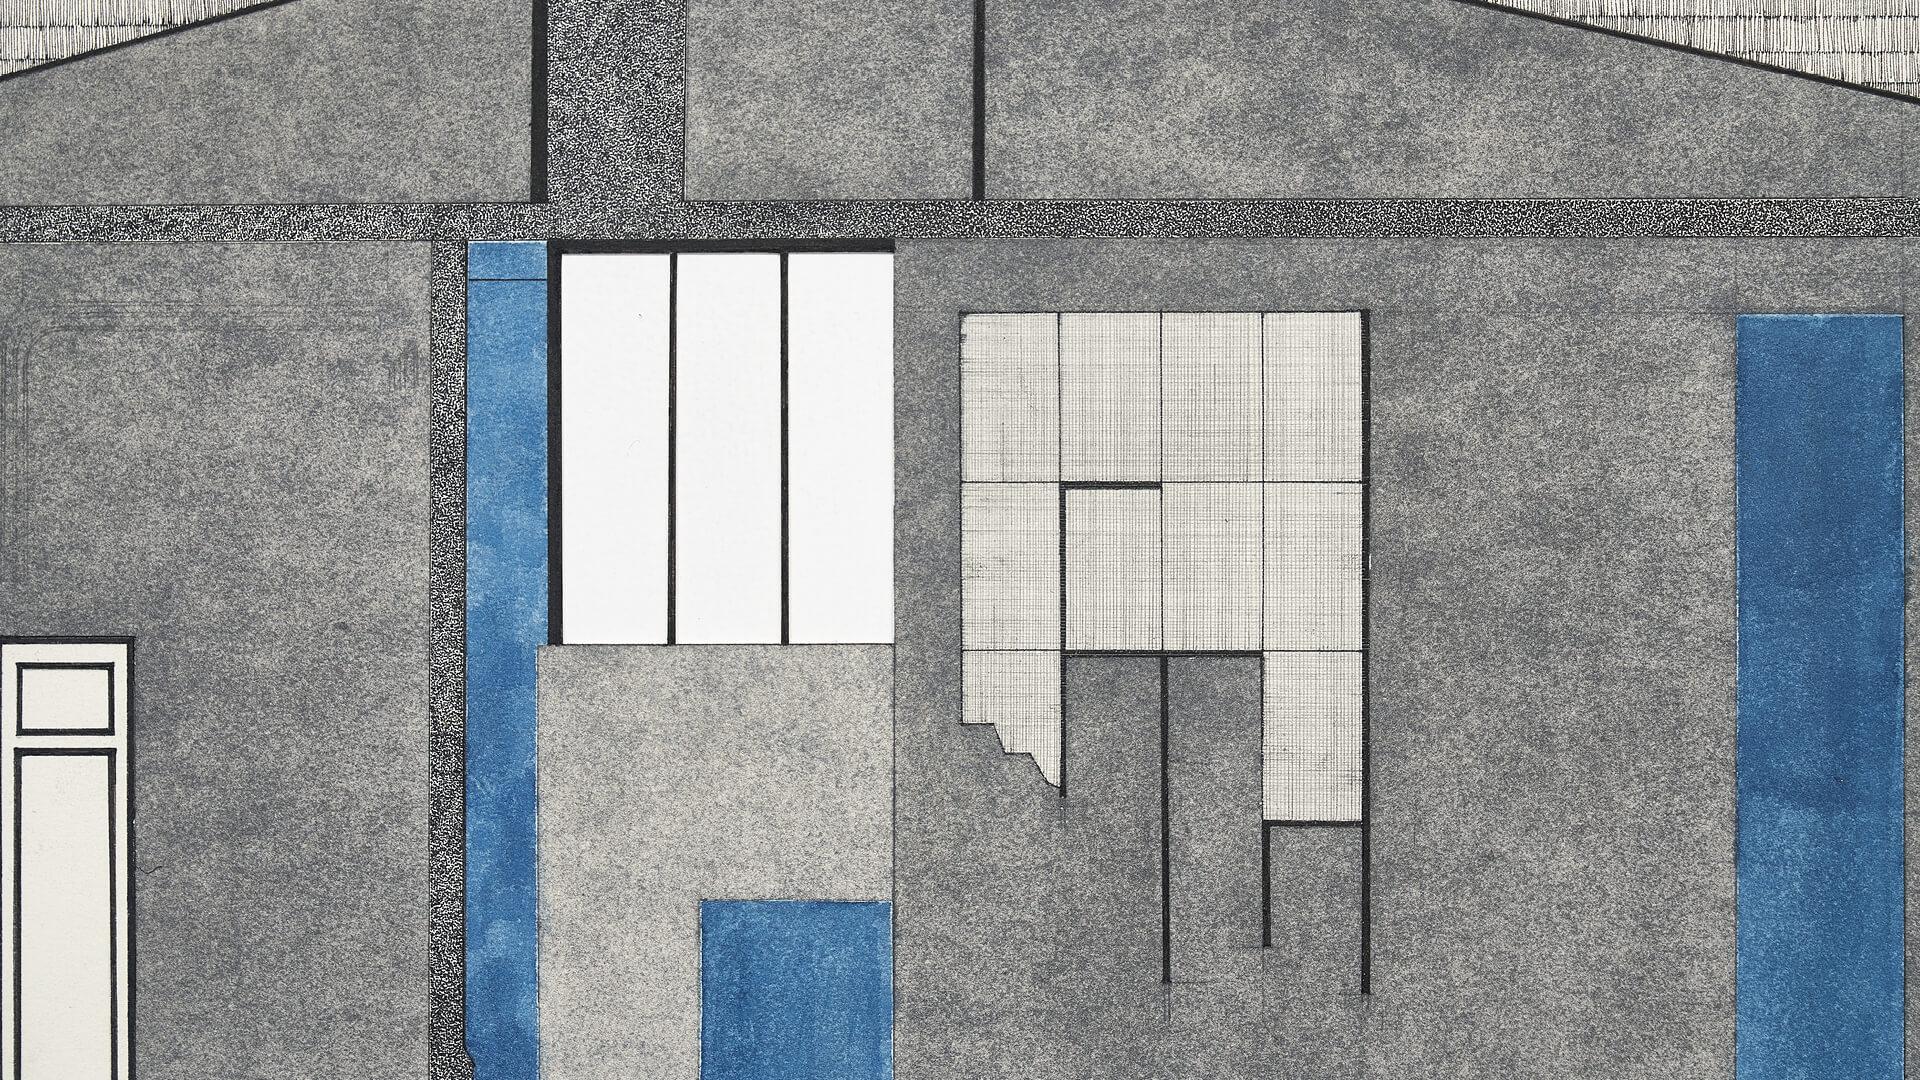 Party Wall Bombay Series, 3 | Folly Measures | Vishwa Shroff | STIRworld